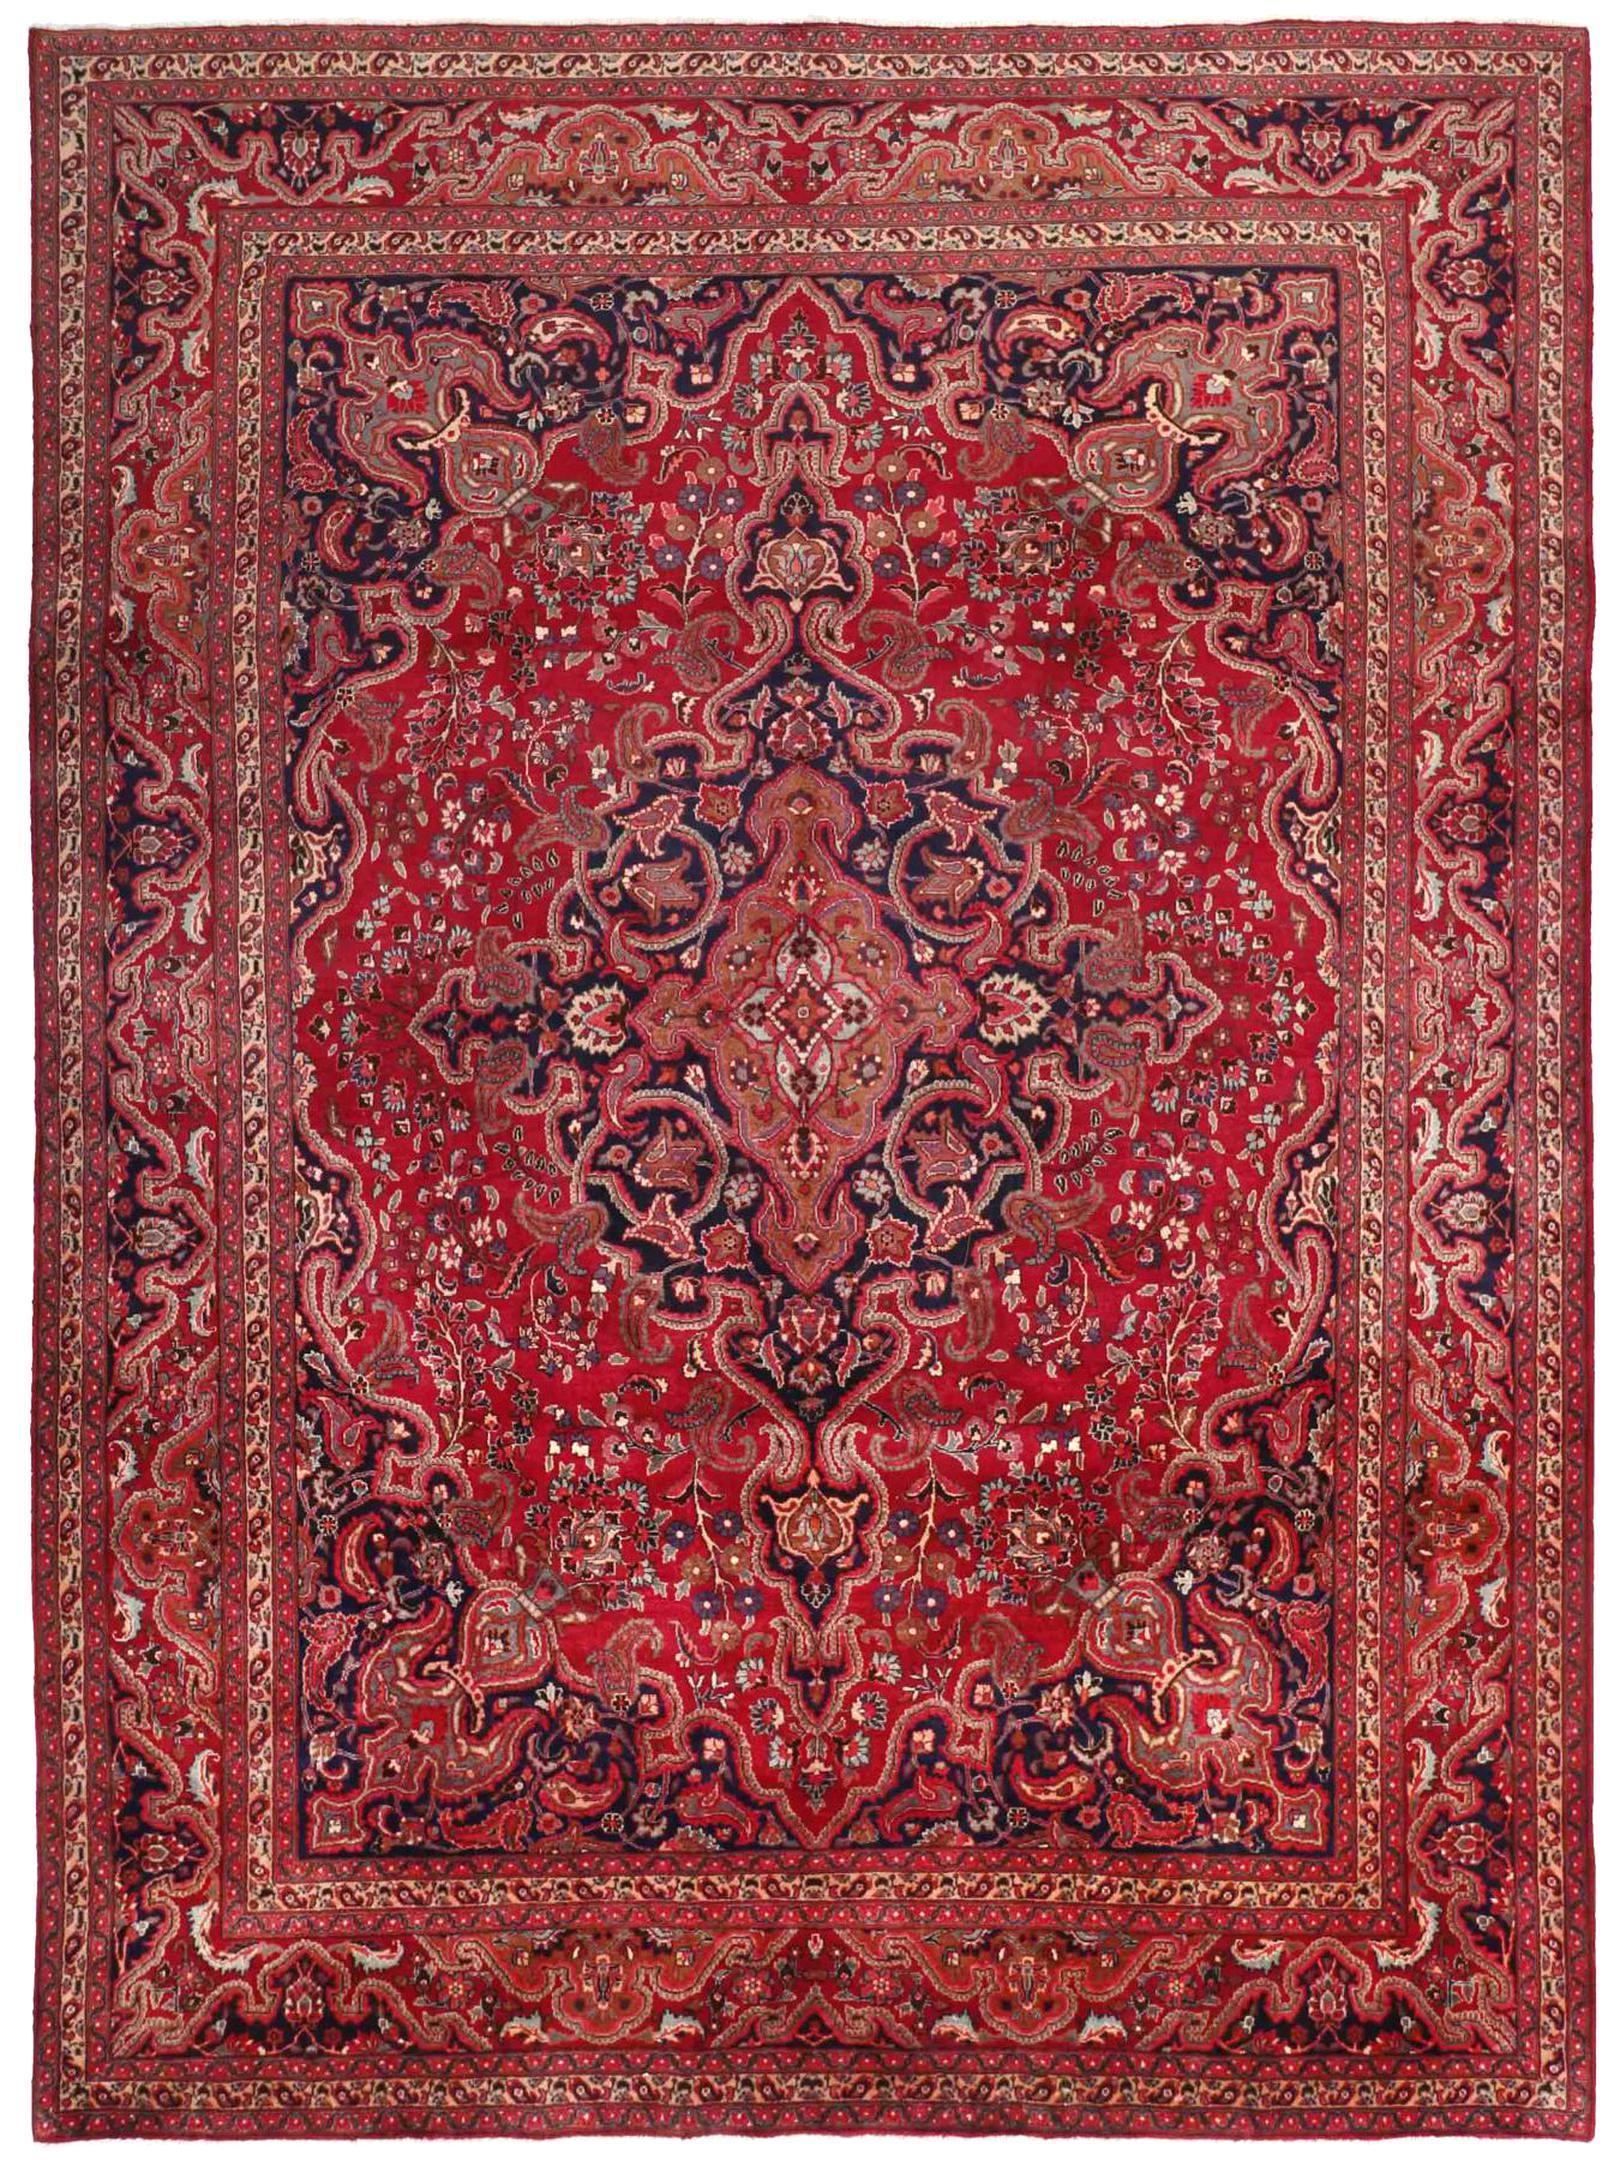 tapis persan d'occasion